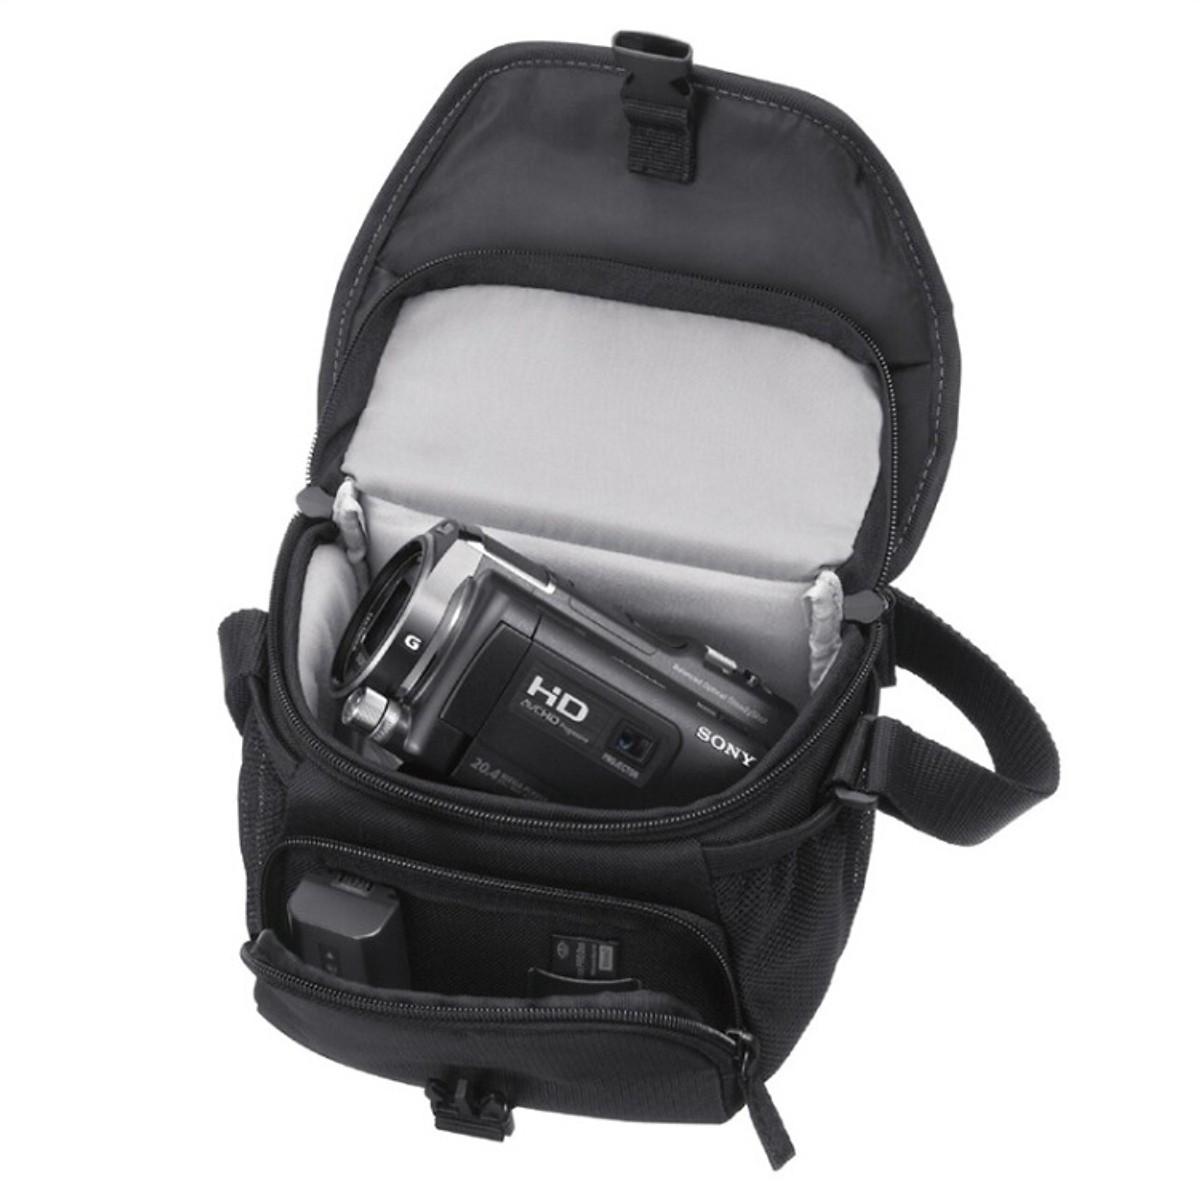 Túi Đựng Máy Ảnh SONY LCS-U11 (Cho Digital Camera / Micro Single Camera)